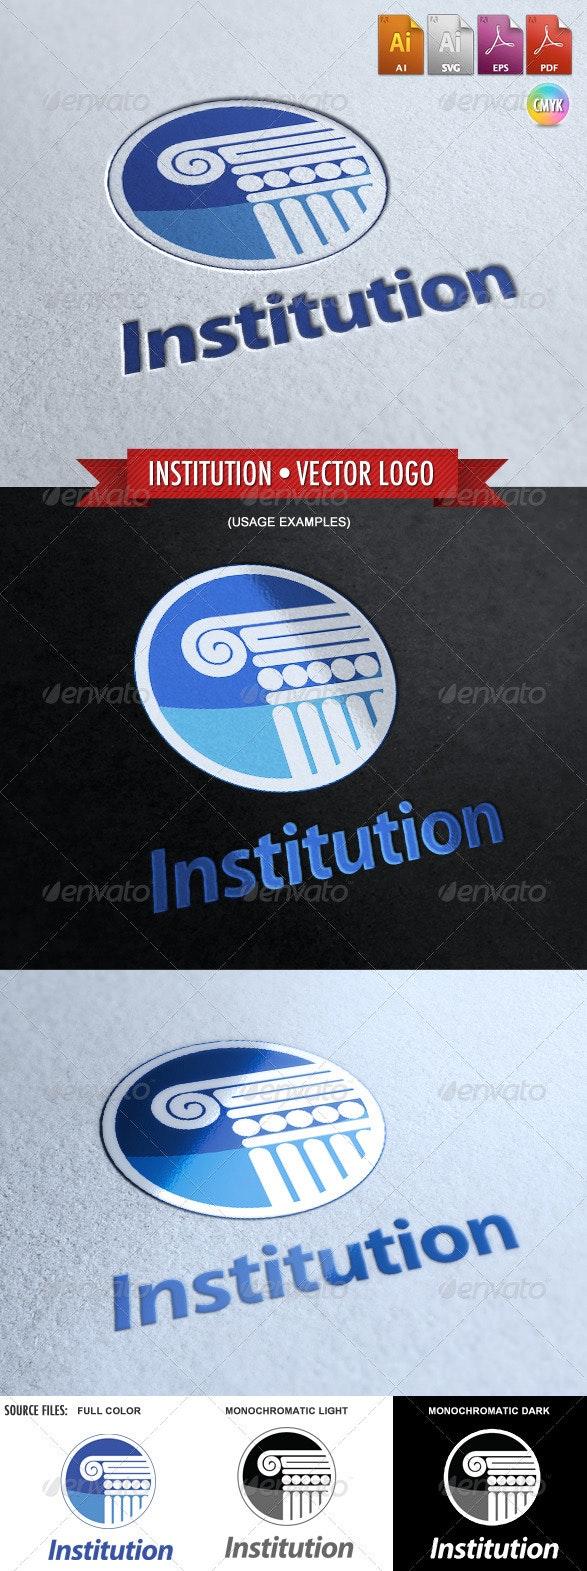 Institution - Vector Logo Template - Buildings Logo Templates